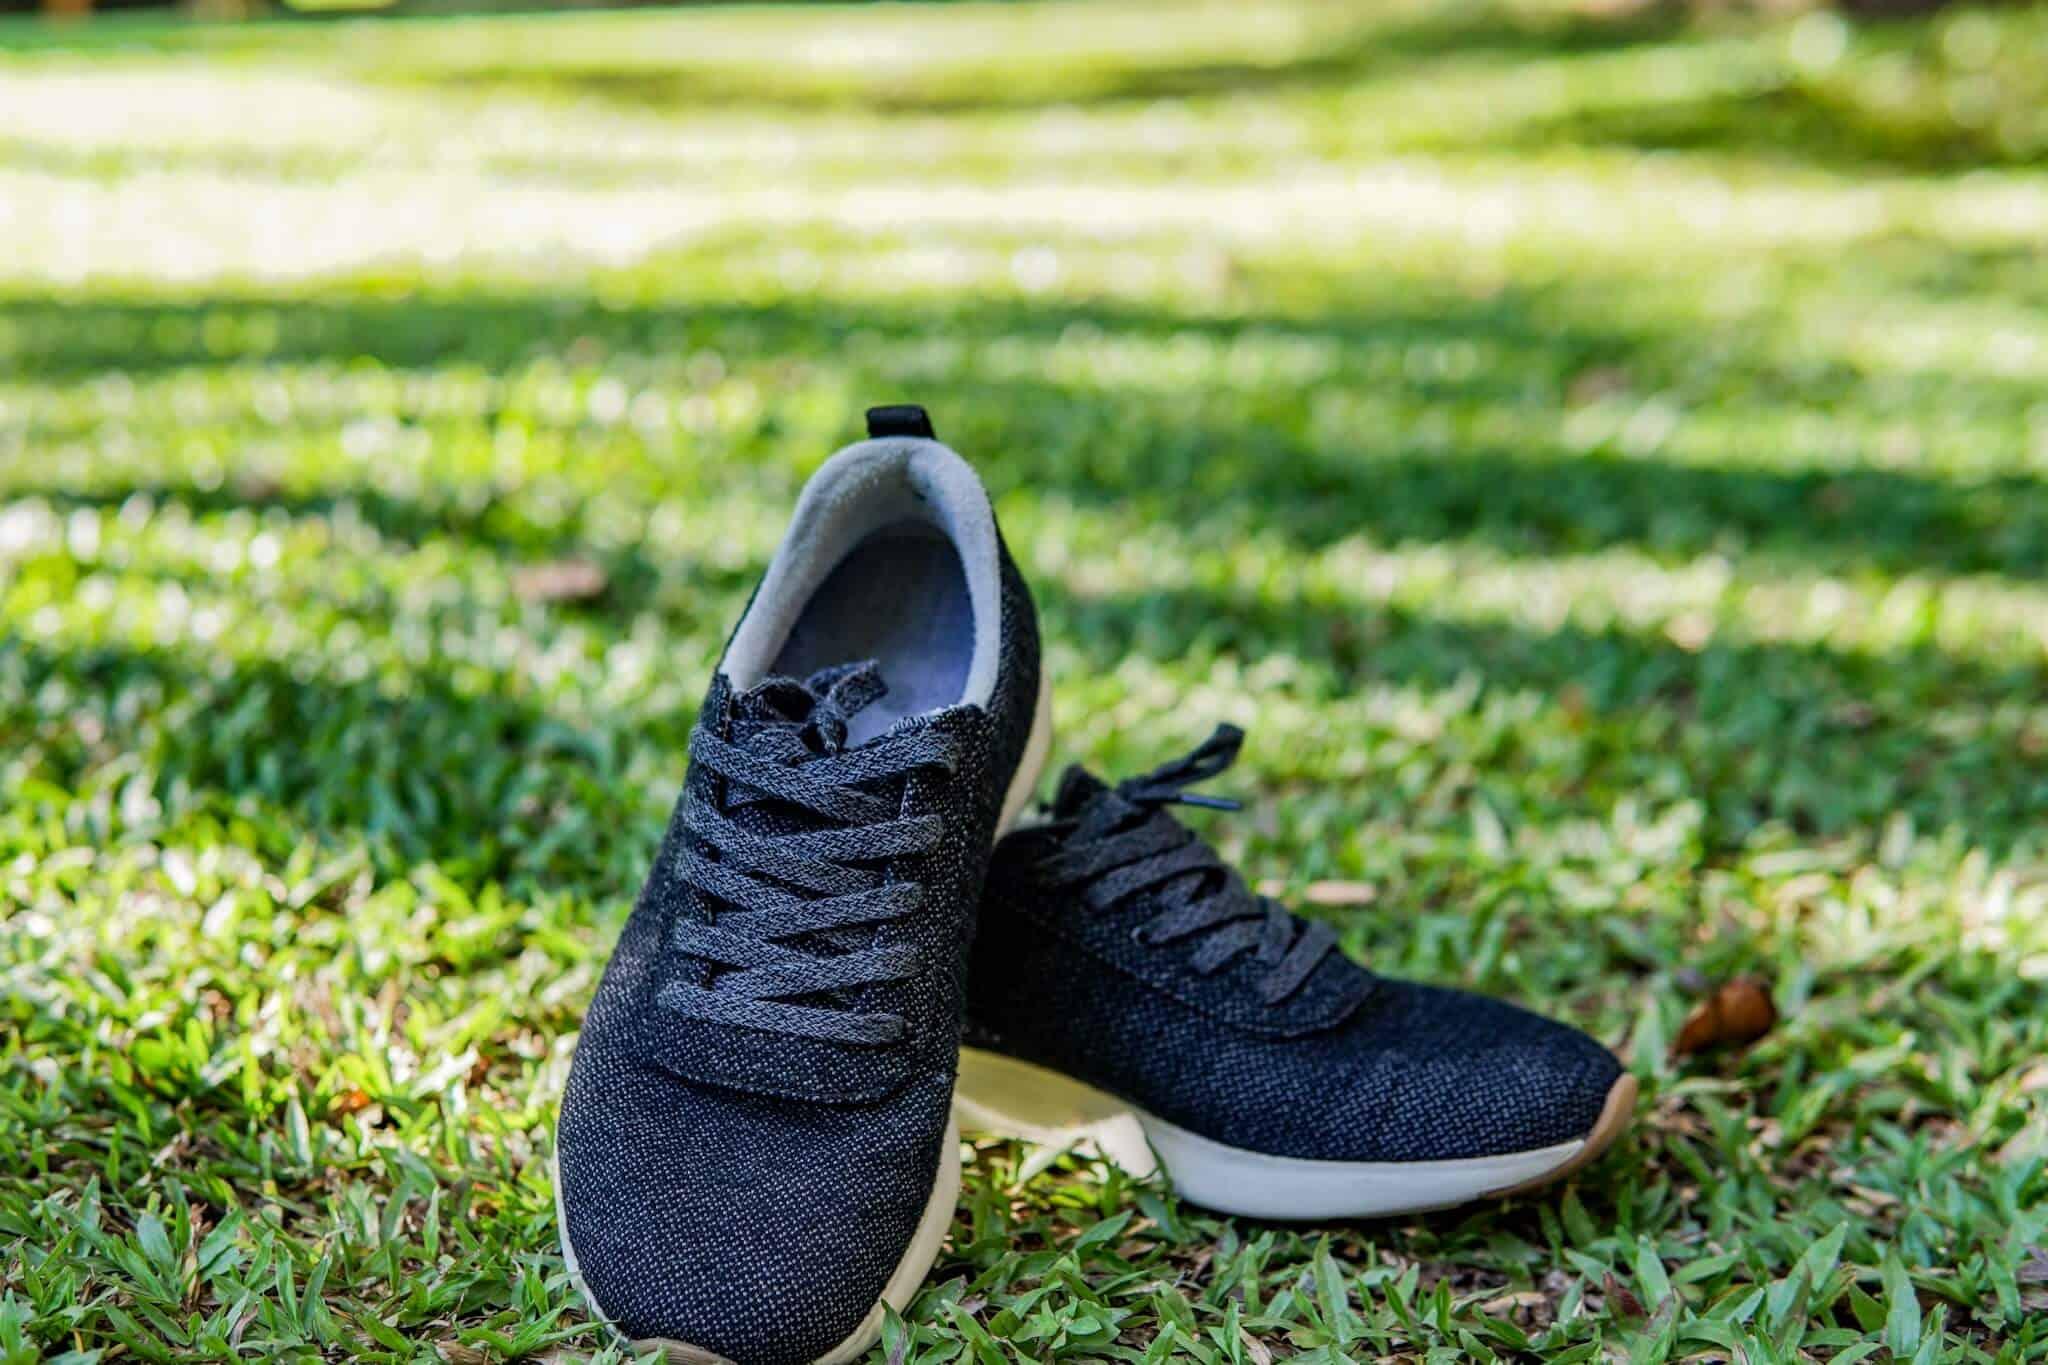 Yuccs Schoes 2